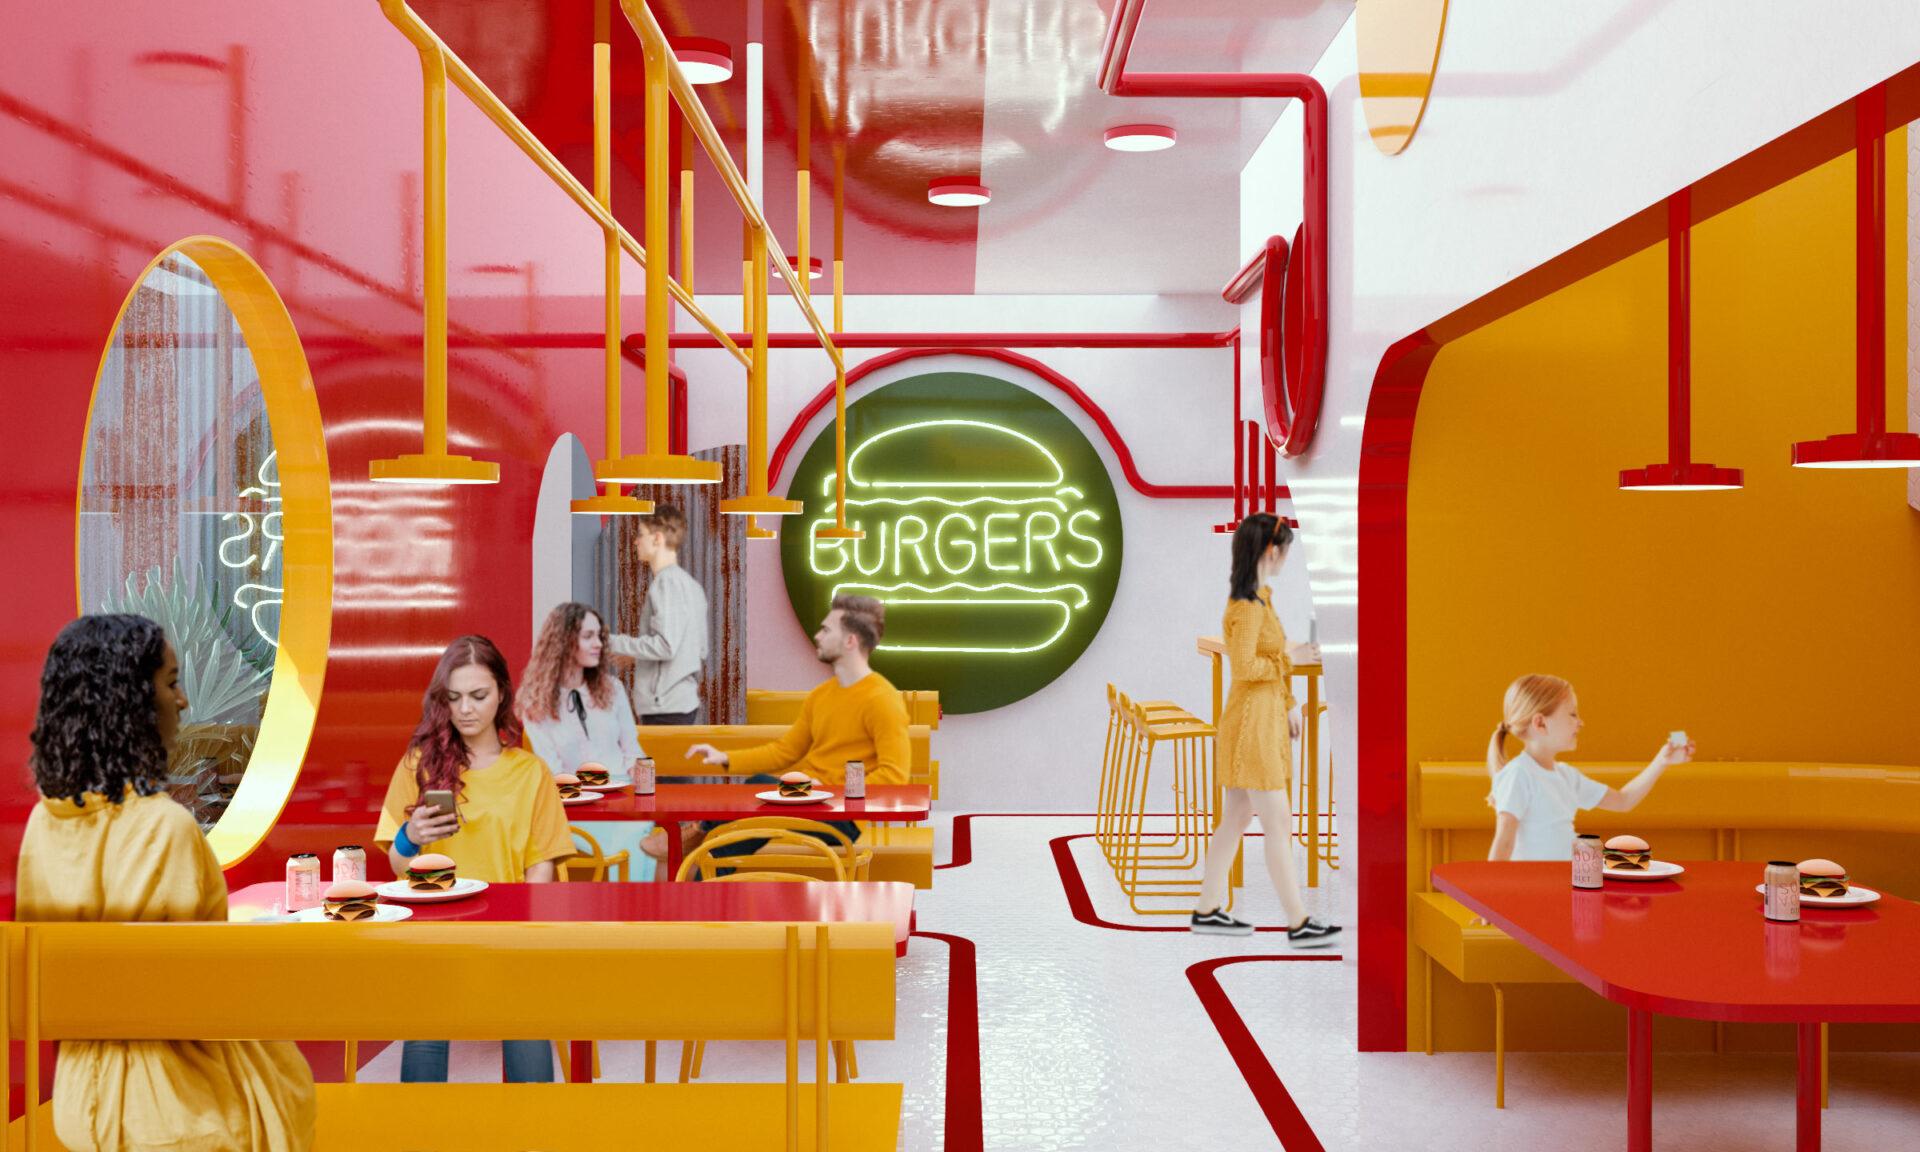 88 Burgers